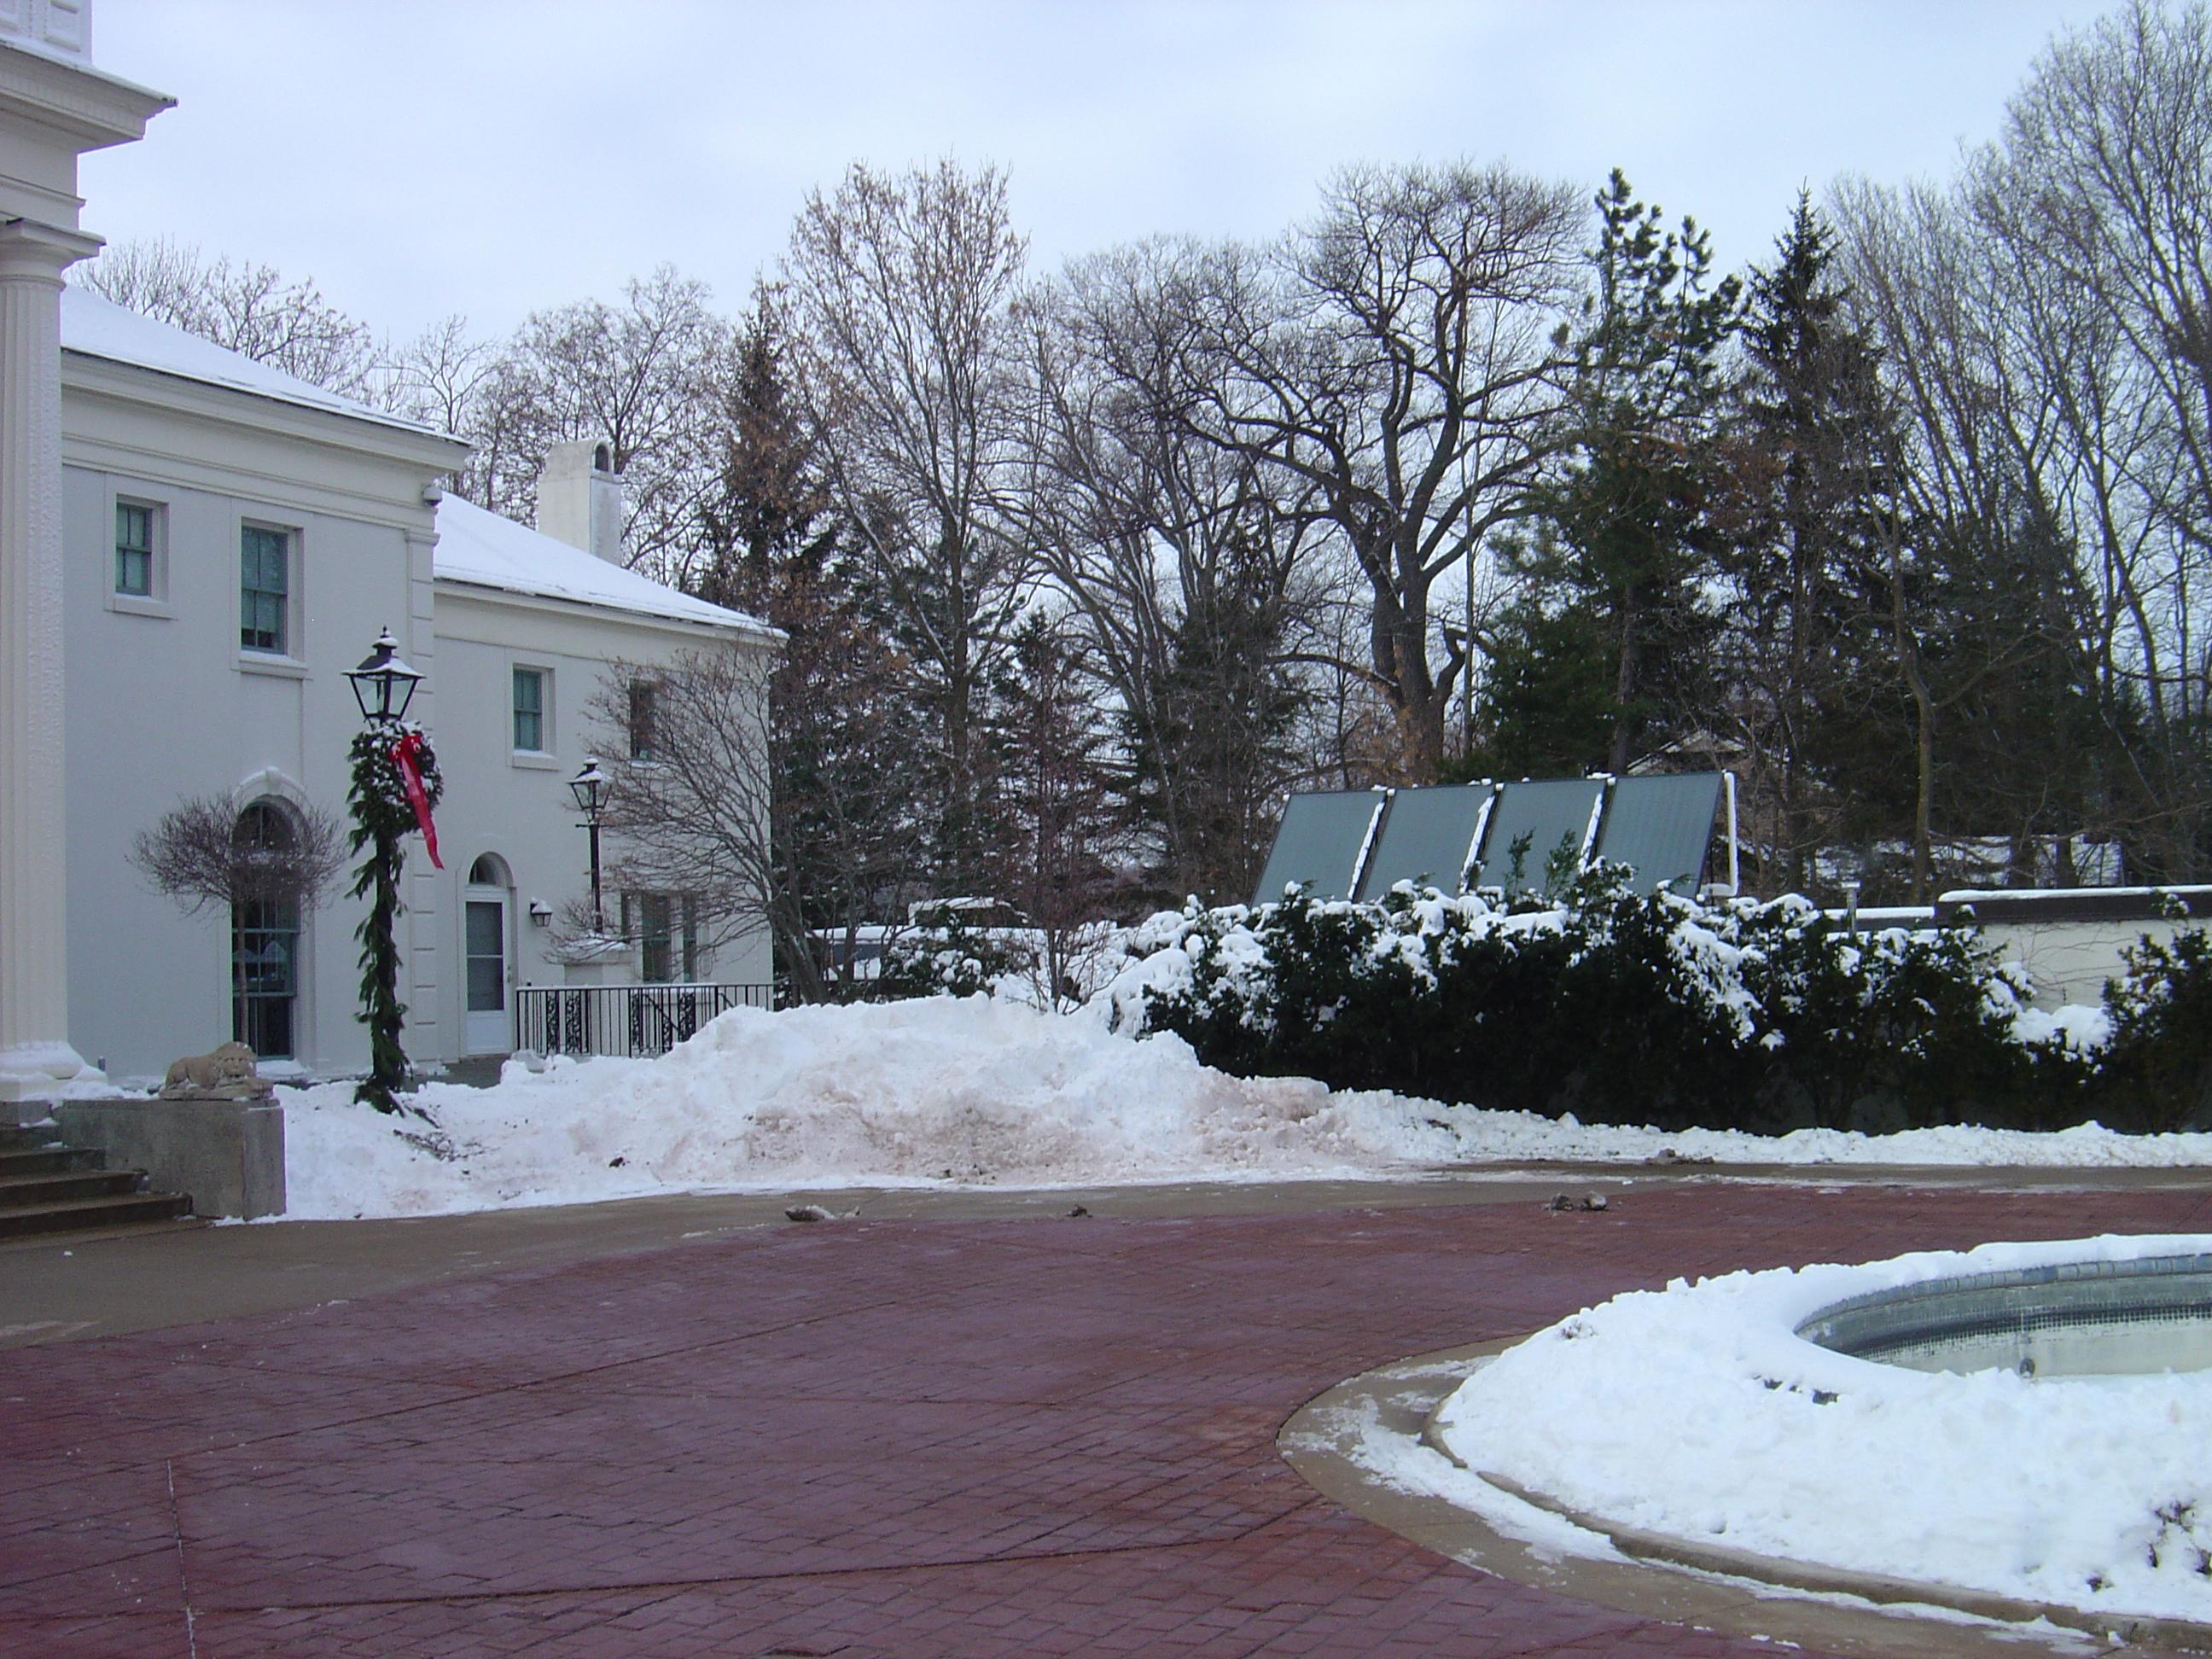 Governor S Mansion